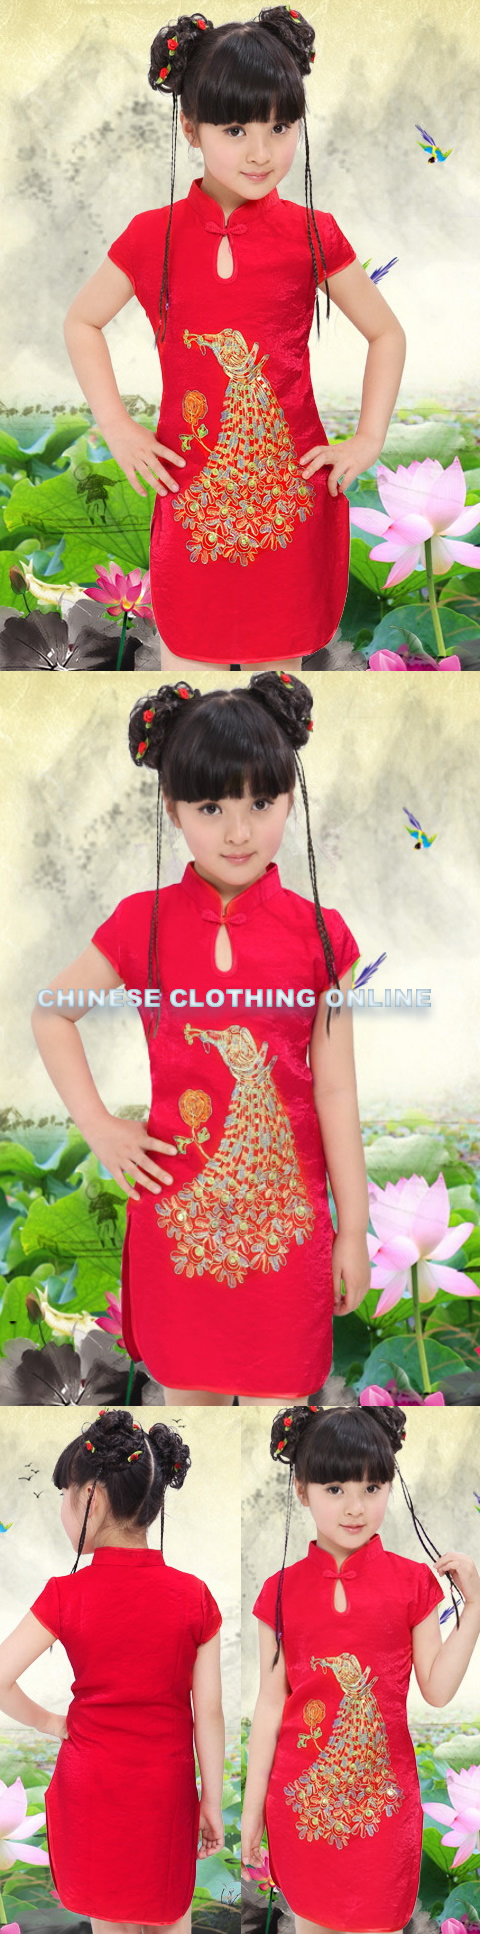 Bargain - Girl's Peacock Embroidery Cheongsam Dress (RM)